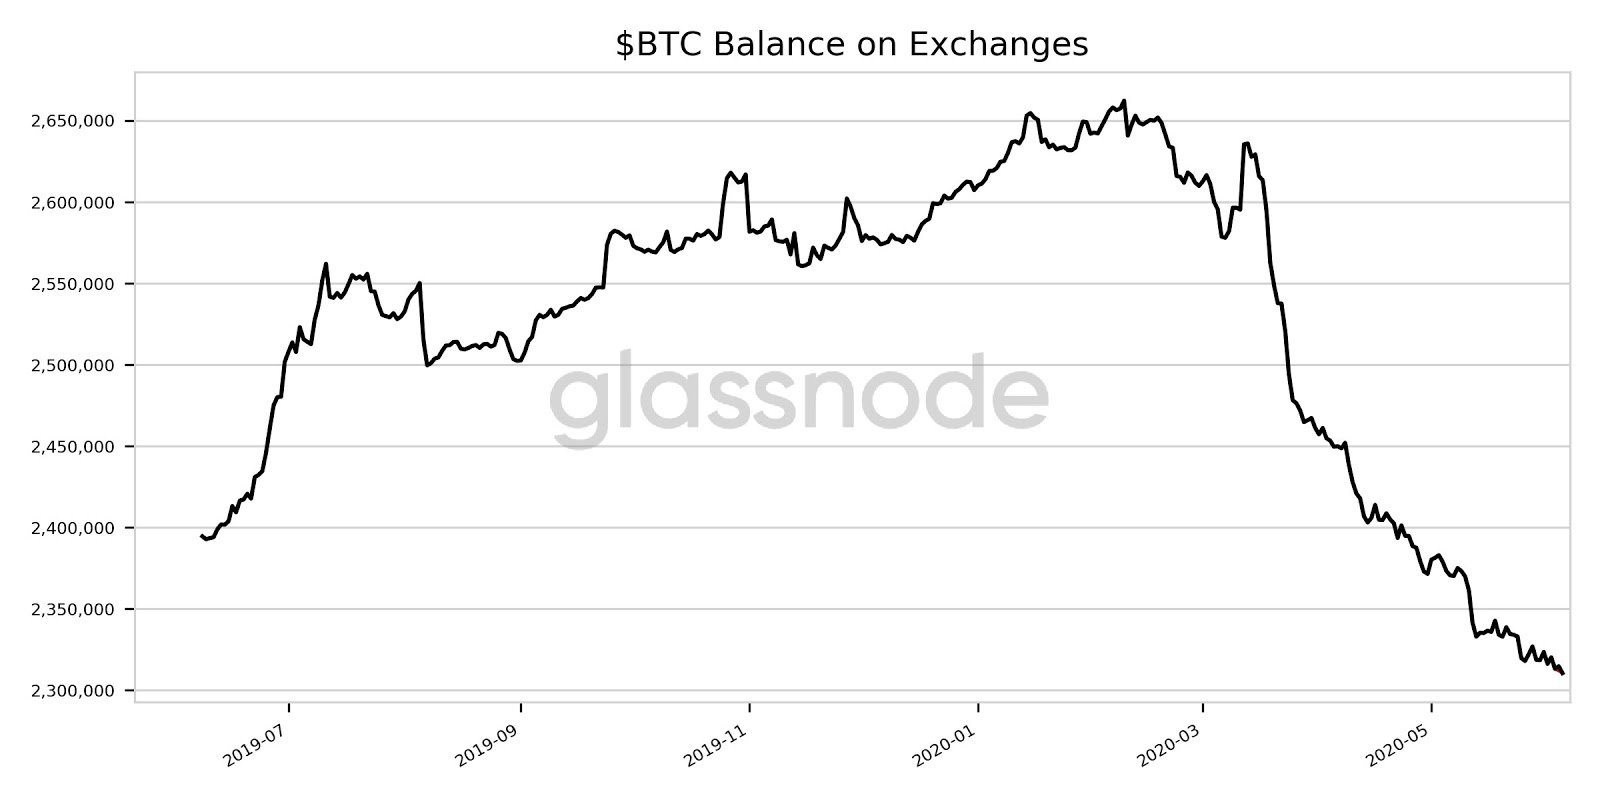 $BTC Balance on Exchanges